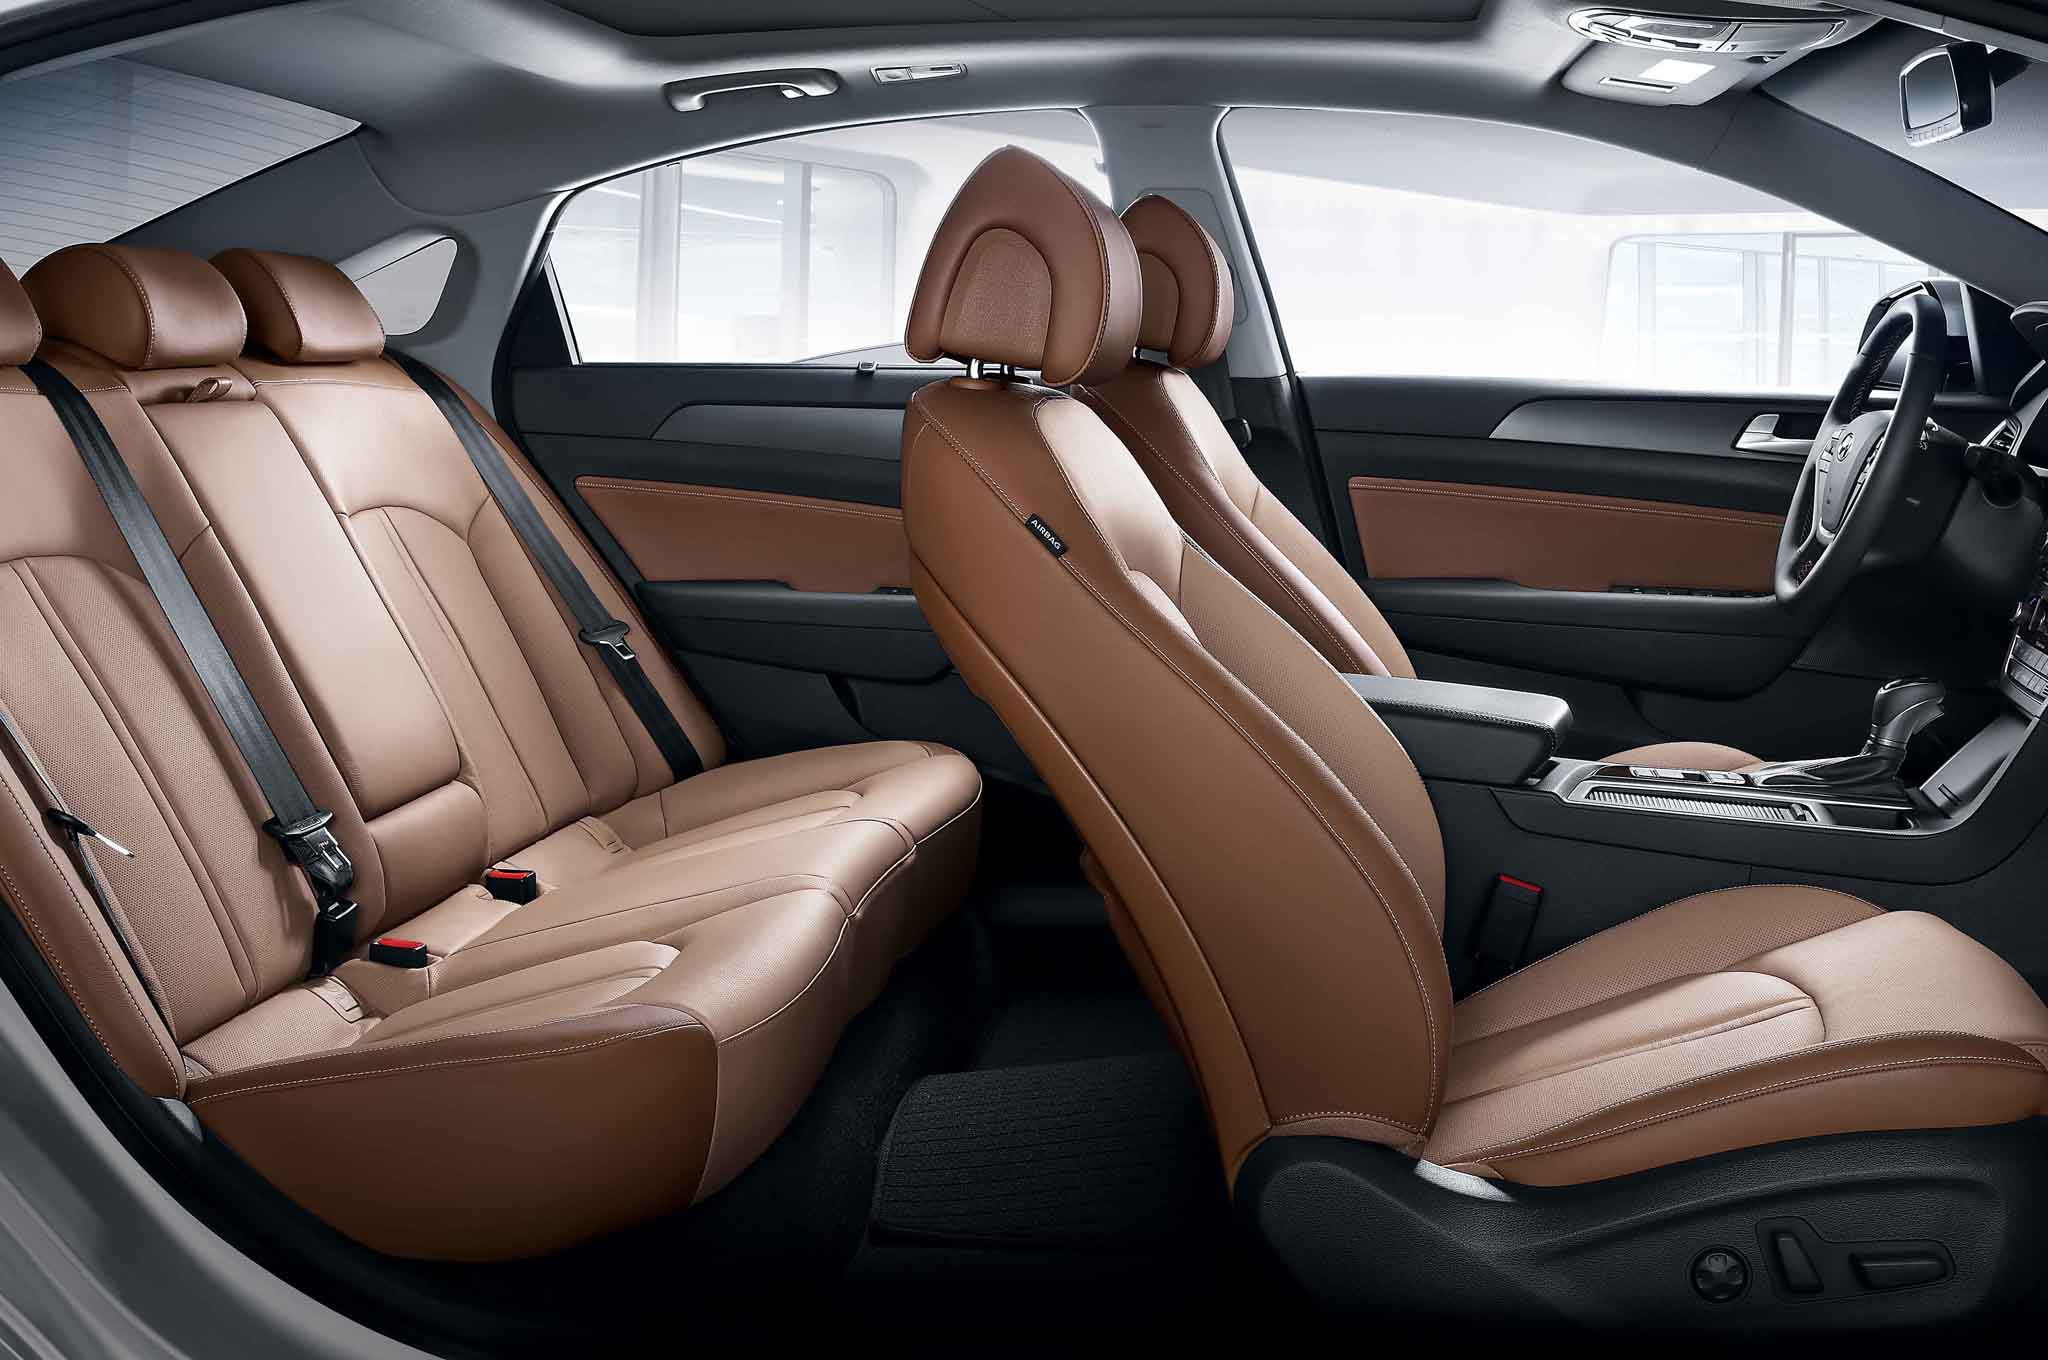 2015 Hyundai Sonata Interior Seats